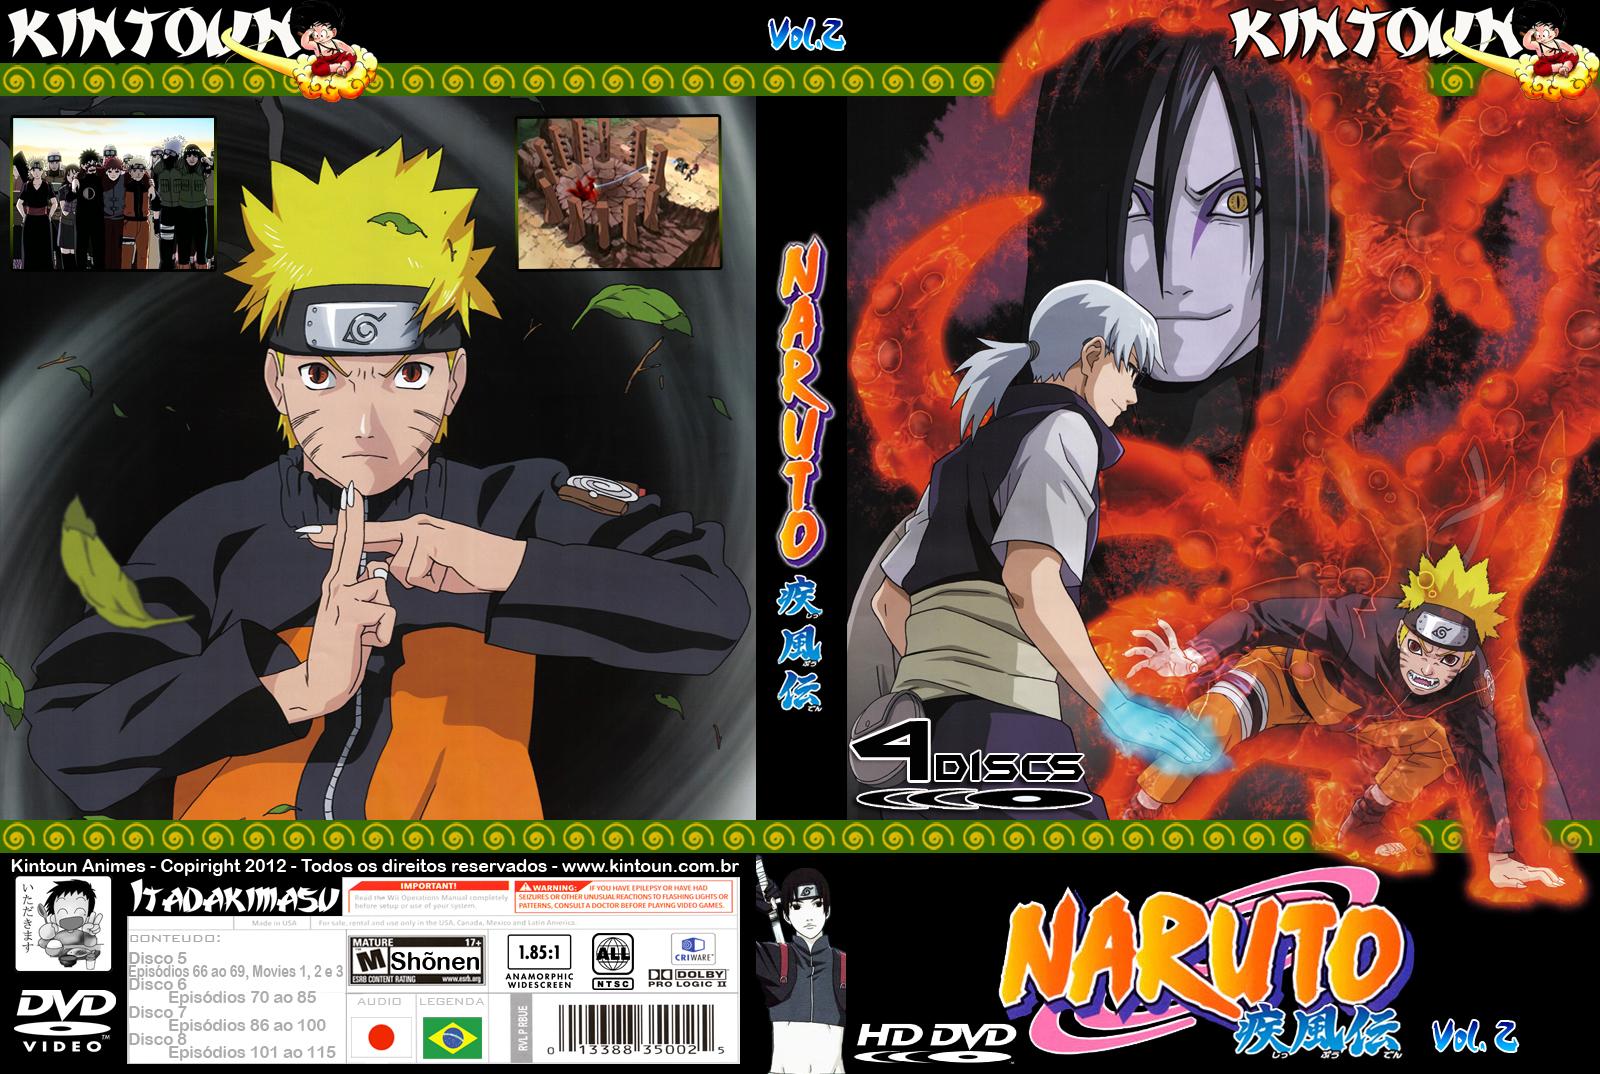 Naruto Shippuden Porn Ic Cartoon Image Sey Wallpapers Filmvz Portal